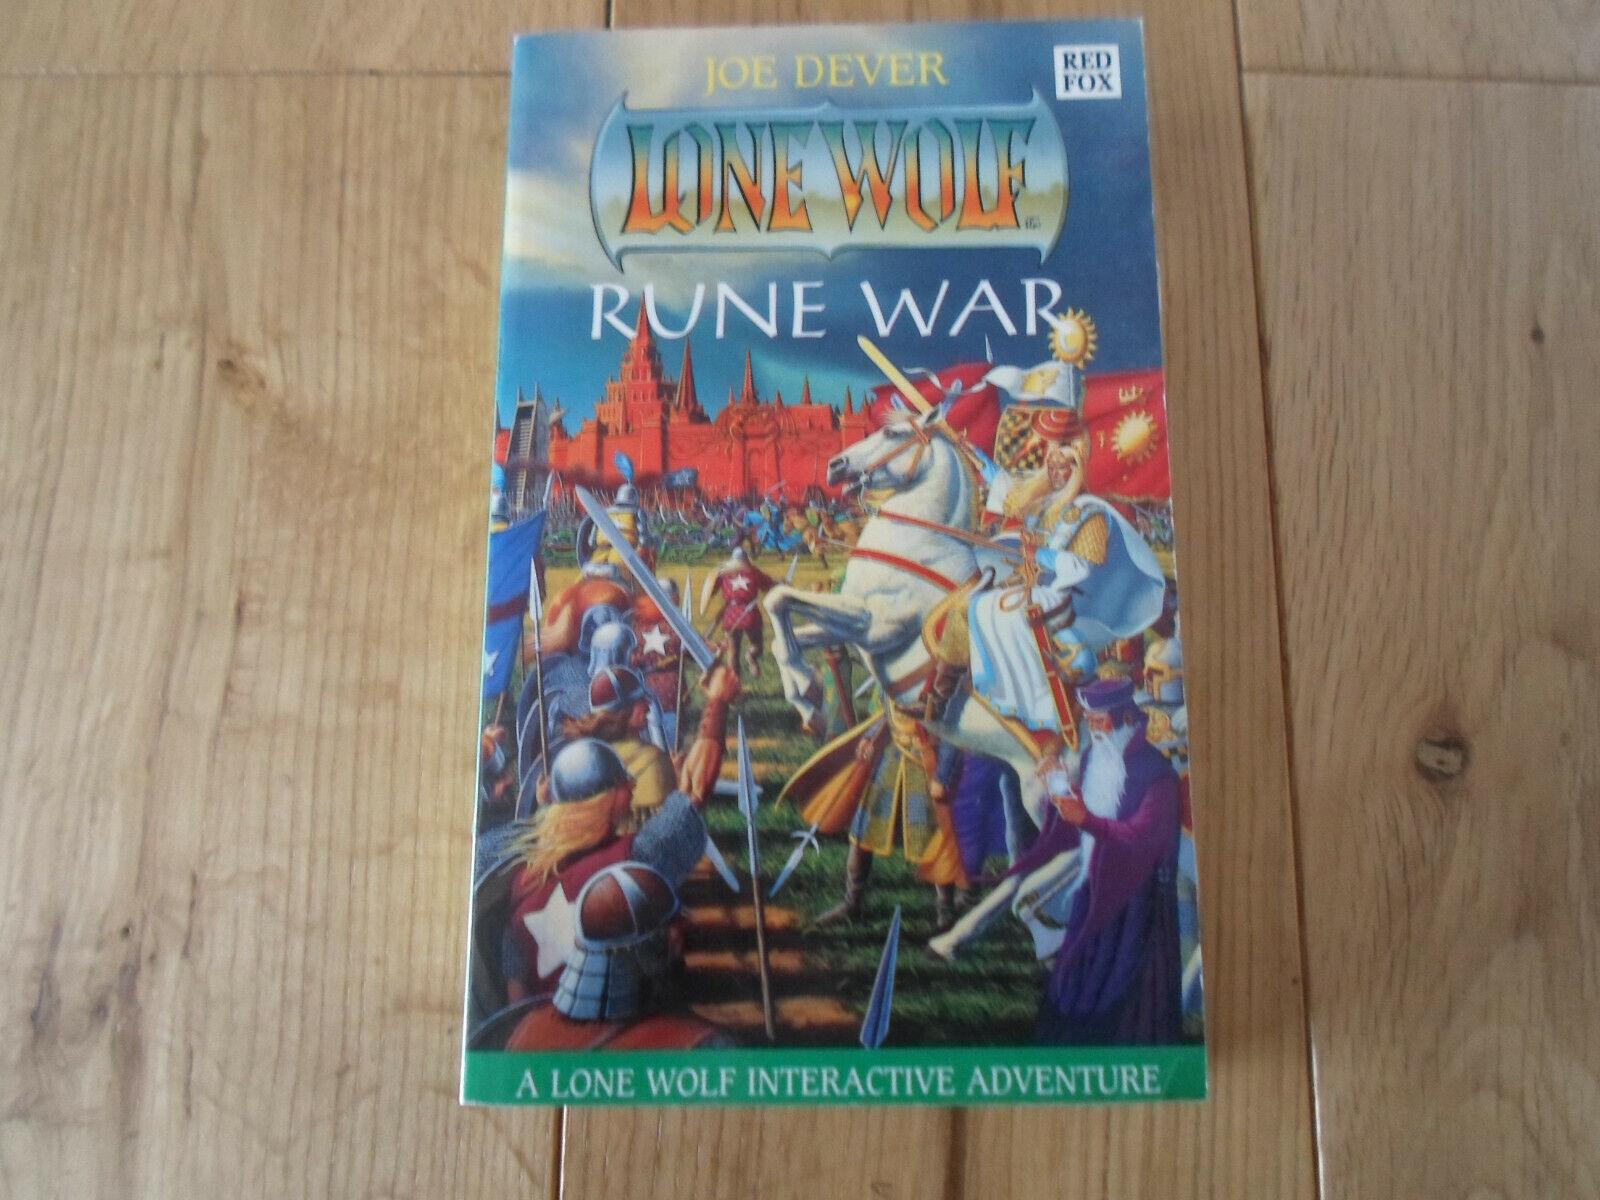 RARE Lone Wolf Joe Dever Rune War bok 24 1st Edition (UNREAD  NM)